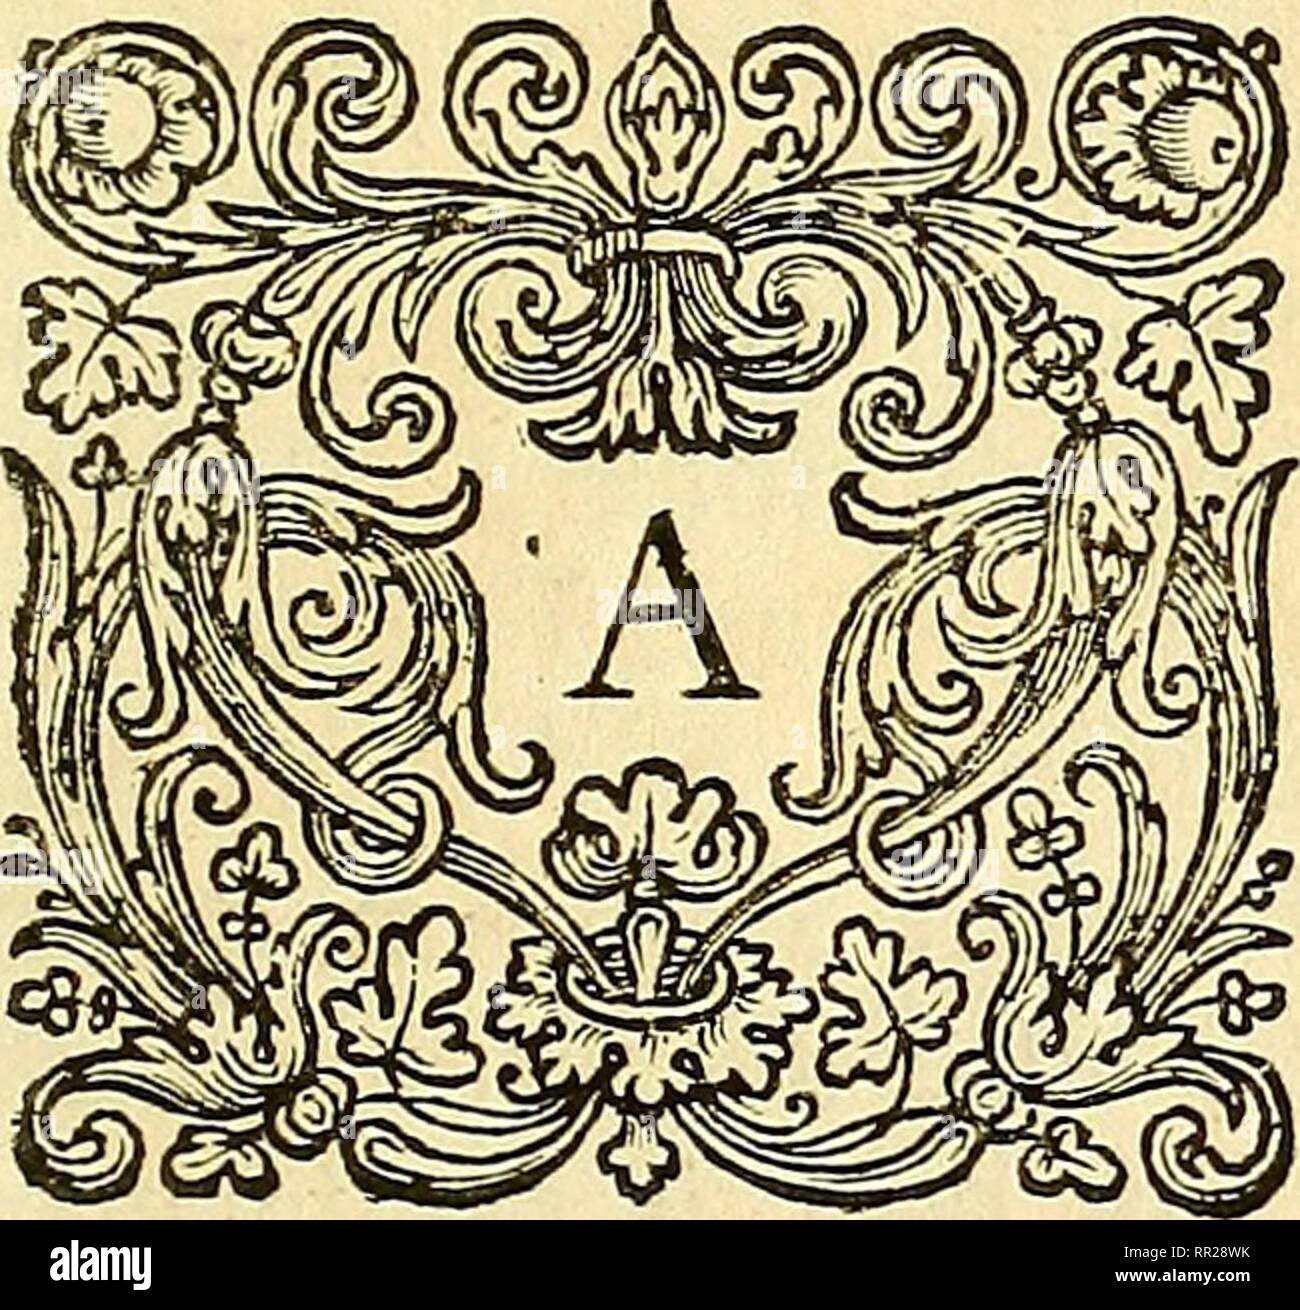 File:Bibliotheca anatomica, medica, chirurgica, etc Fleuron T113958